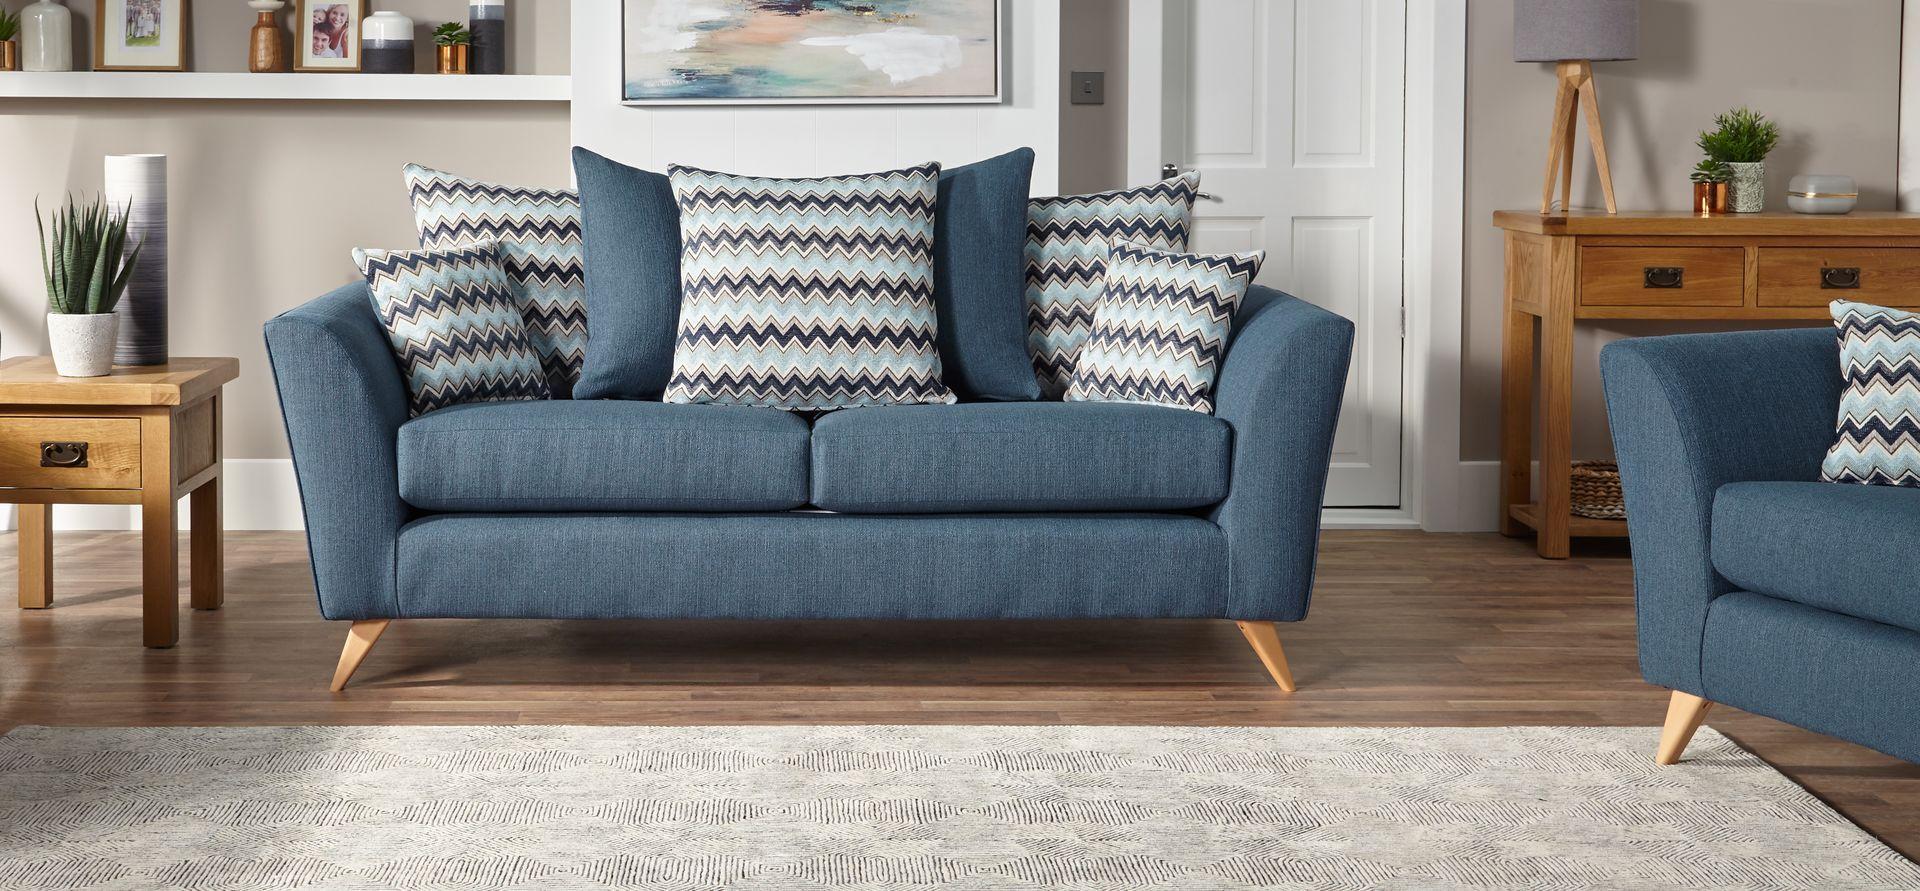 Solo 3 Seater Sofa Scatter Back Scs Seater Sofa 3 Seater Sofa Blue Sofa